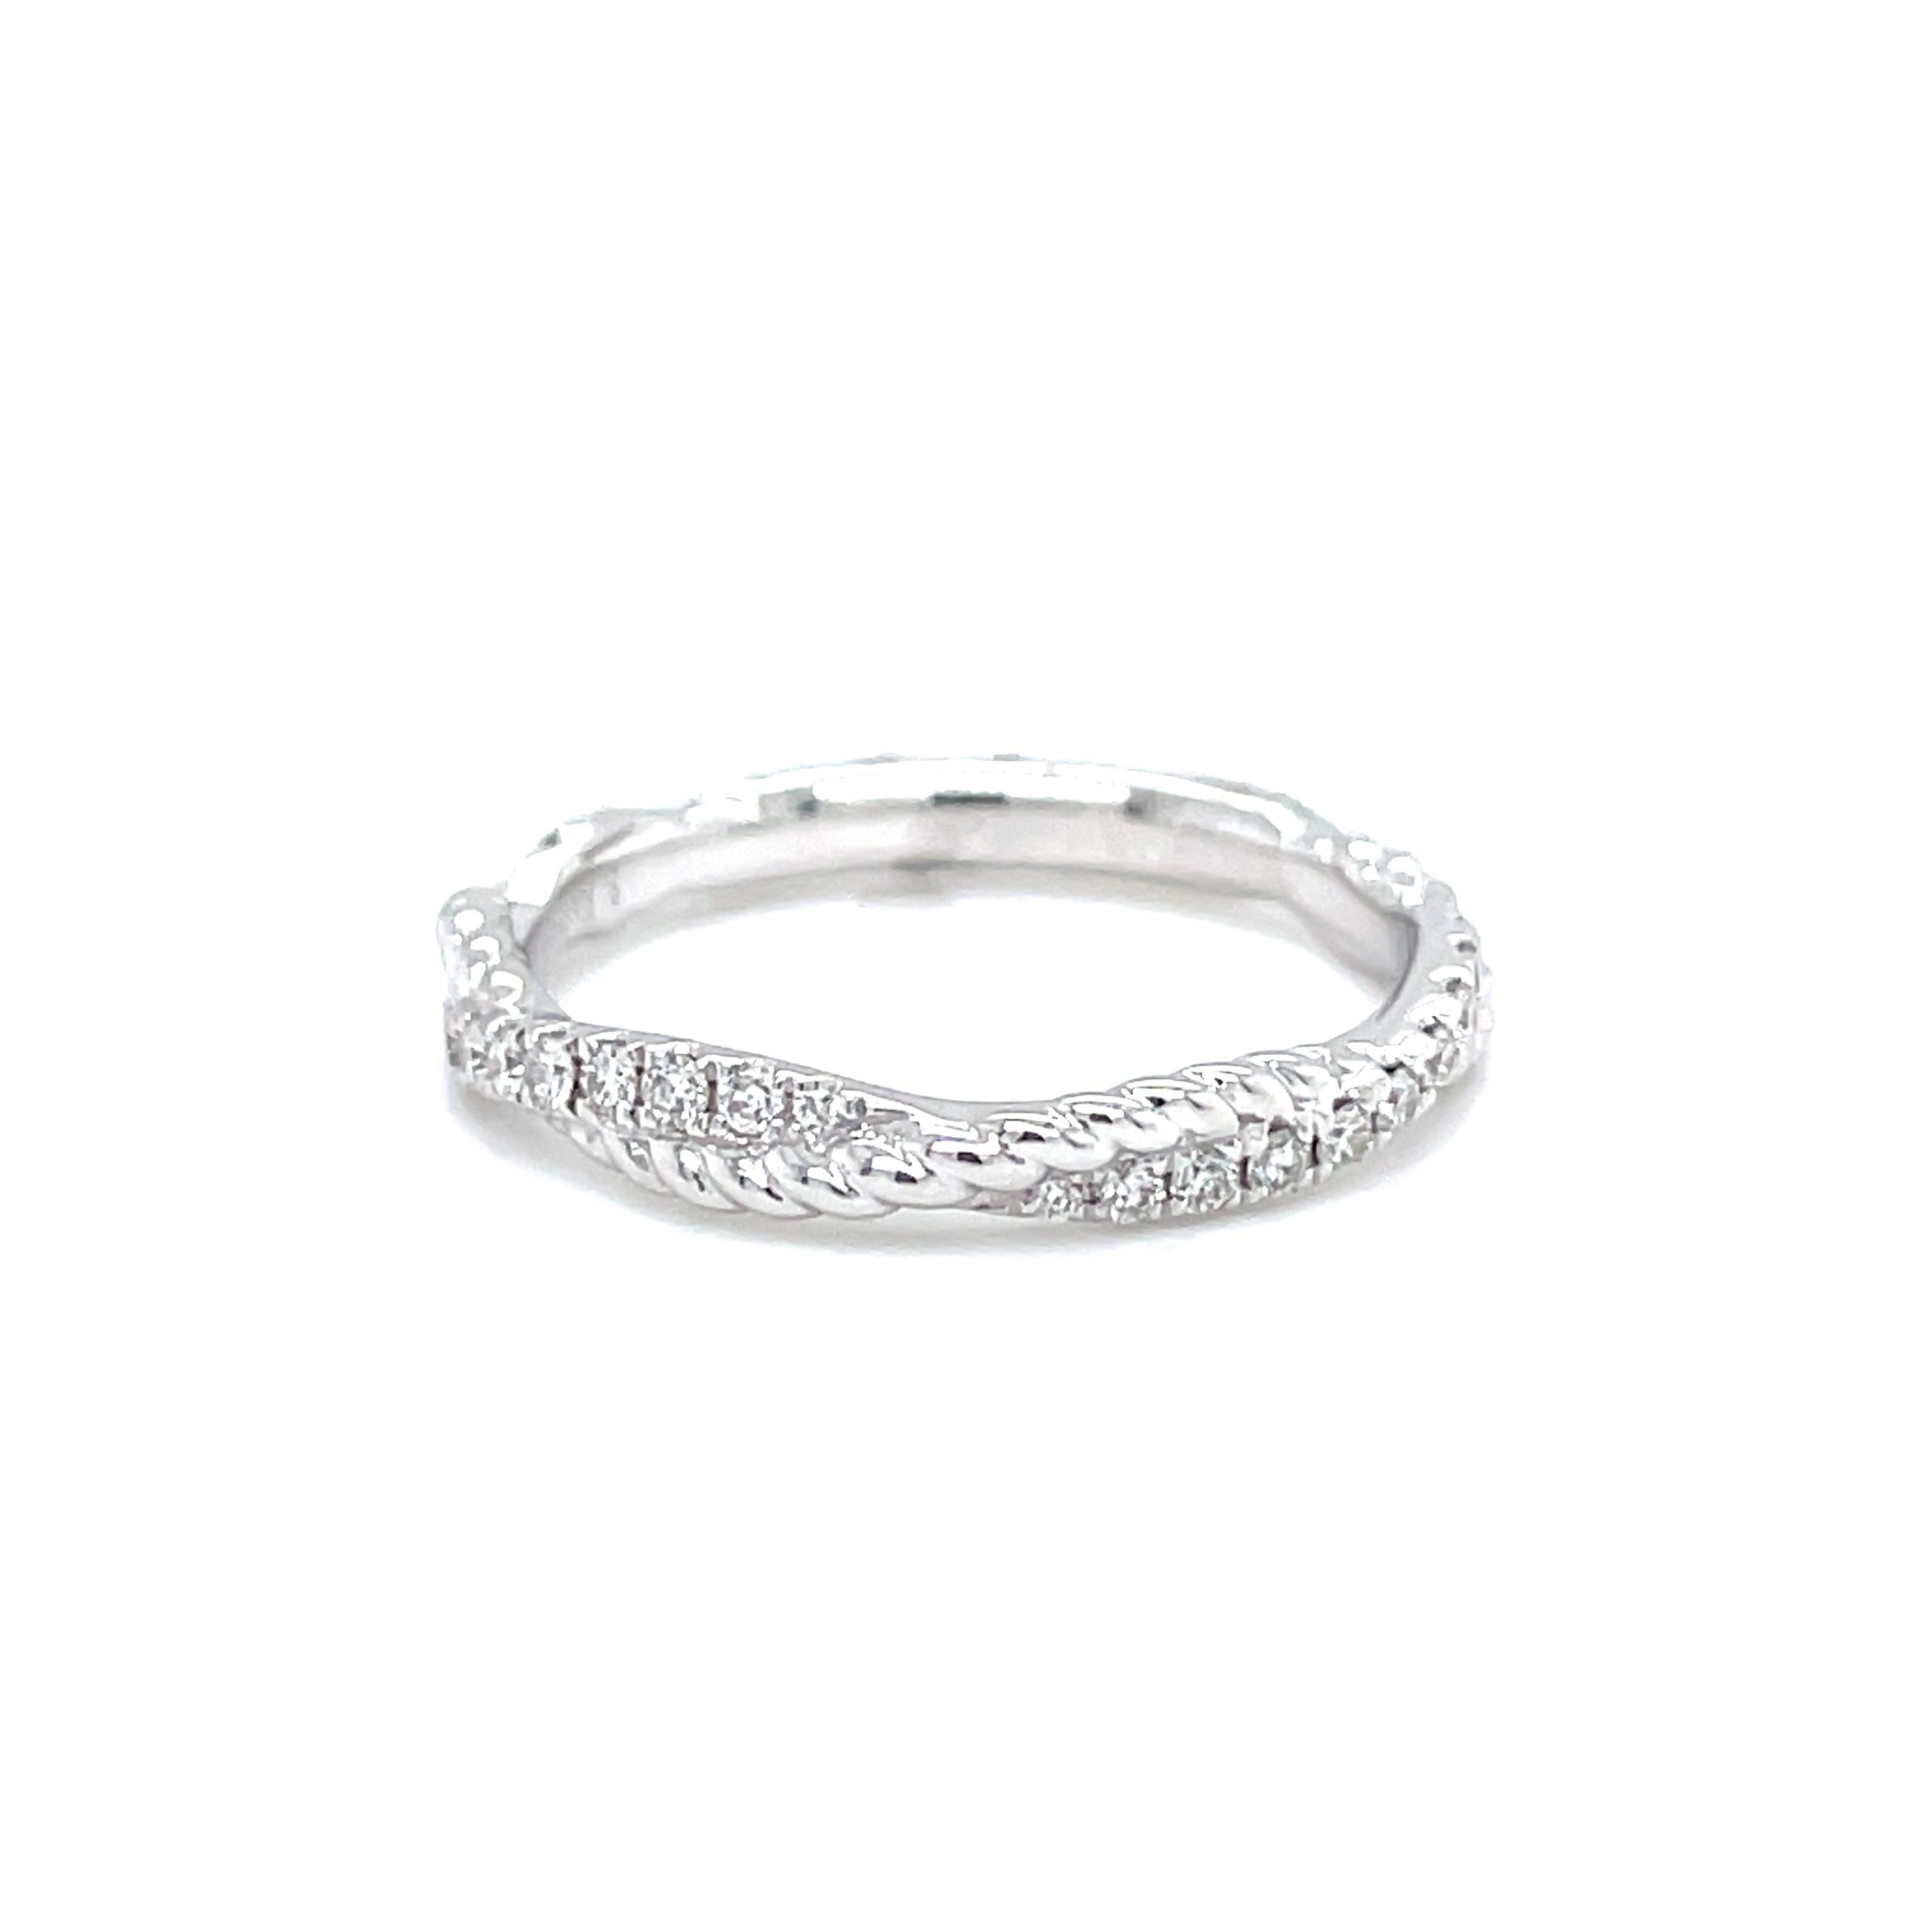 14k White Gold Diamond Braid Ring